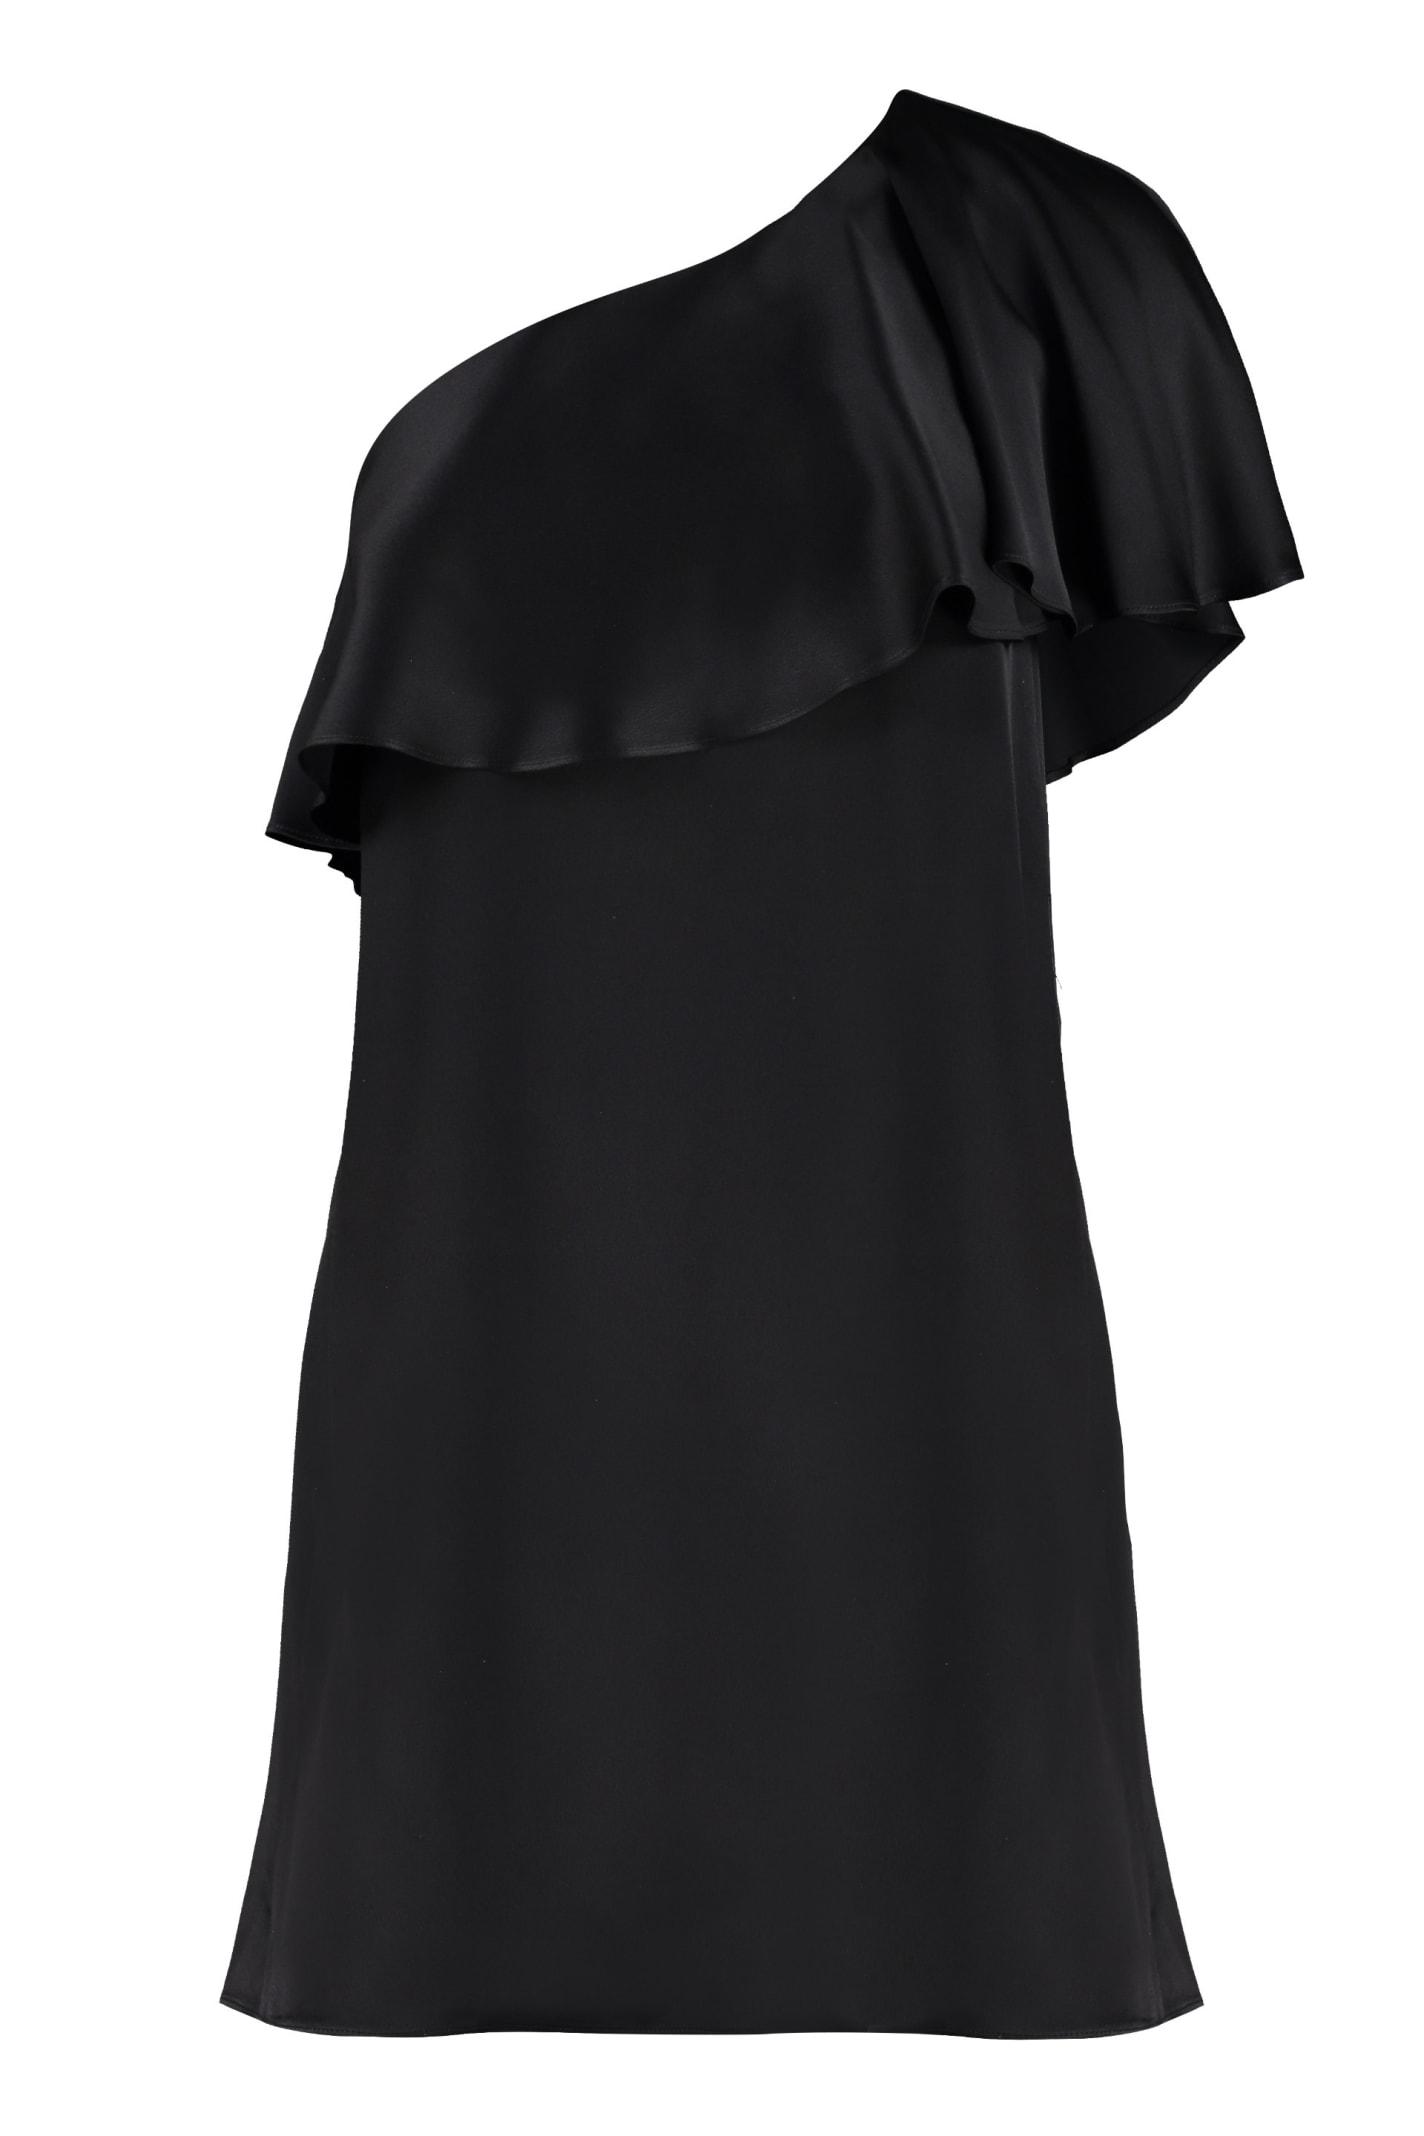 Buy Saint Laurent Crepe-satin One-shoulder Dress online, shop Saint Laurent with free shipping